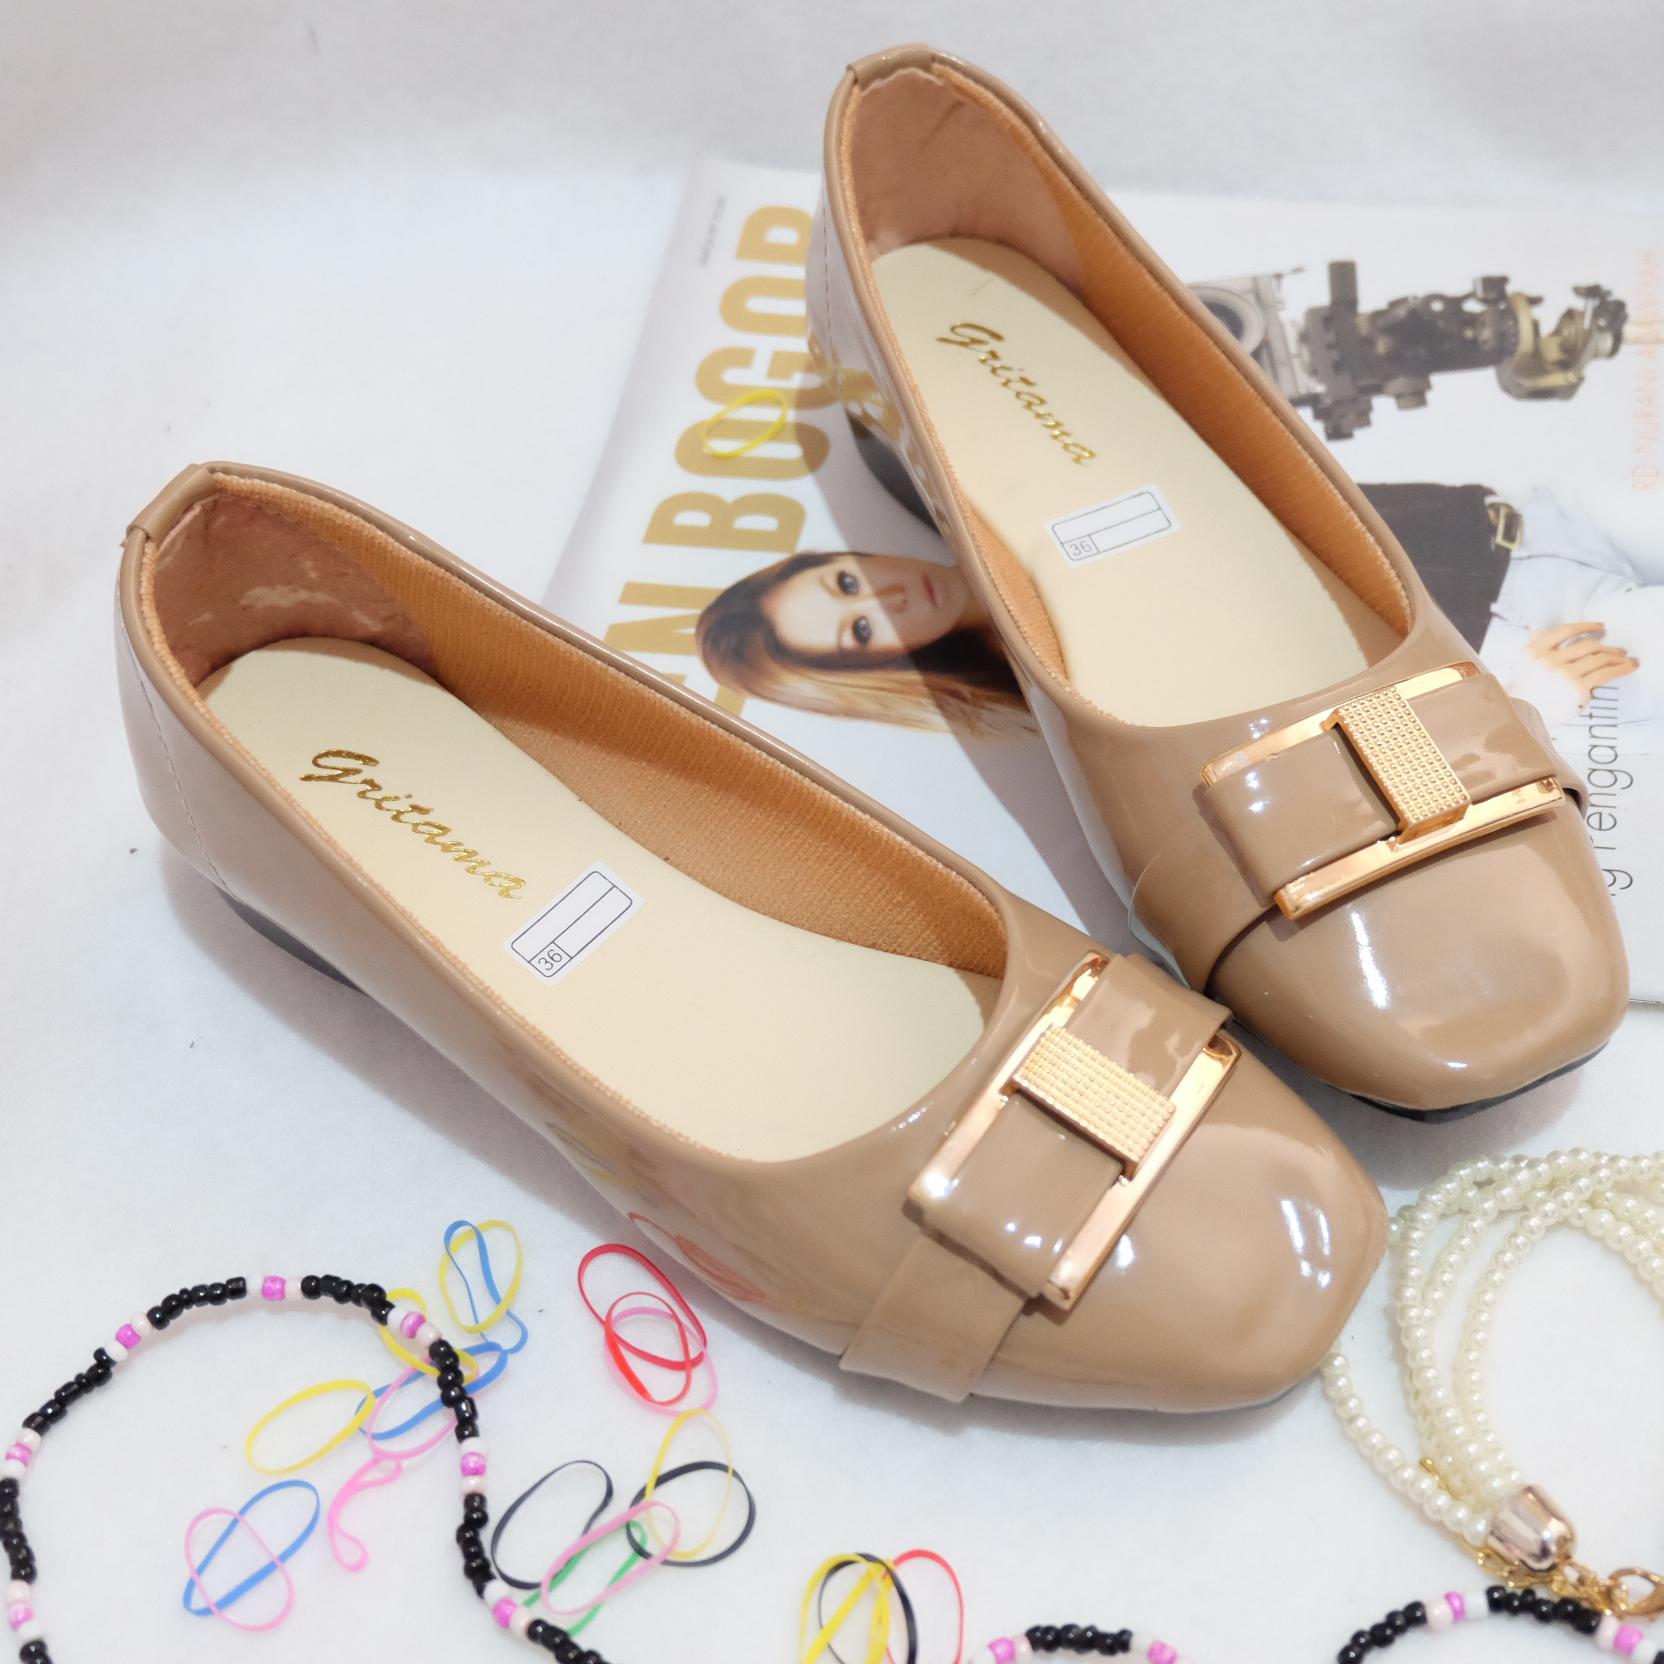 Jual PK55 - Sepatu Wanita Flat Shoes Cantik - Sepatu Remaja Black & Mocca - La